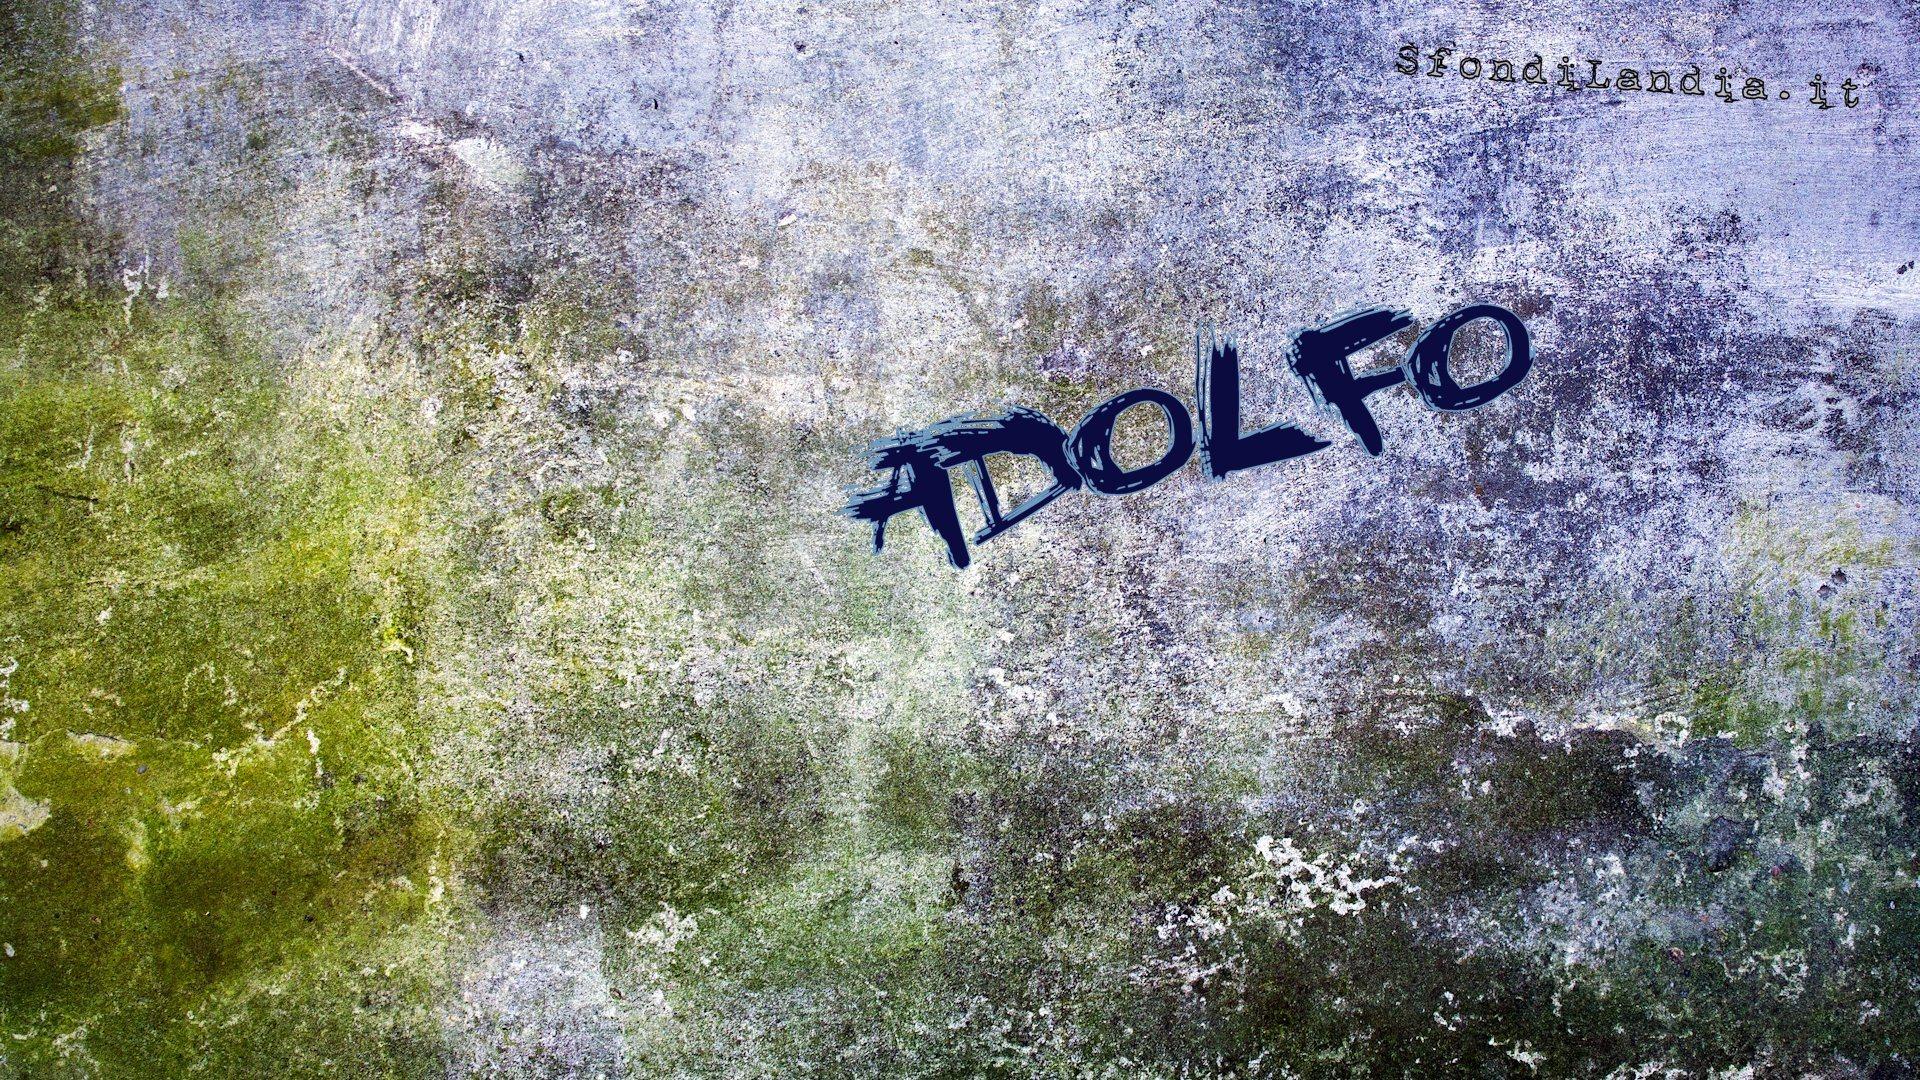 Adolfo